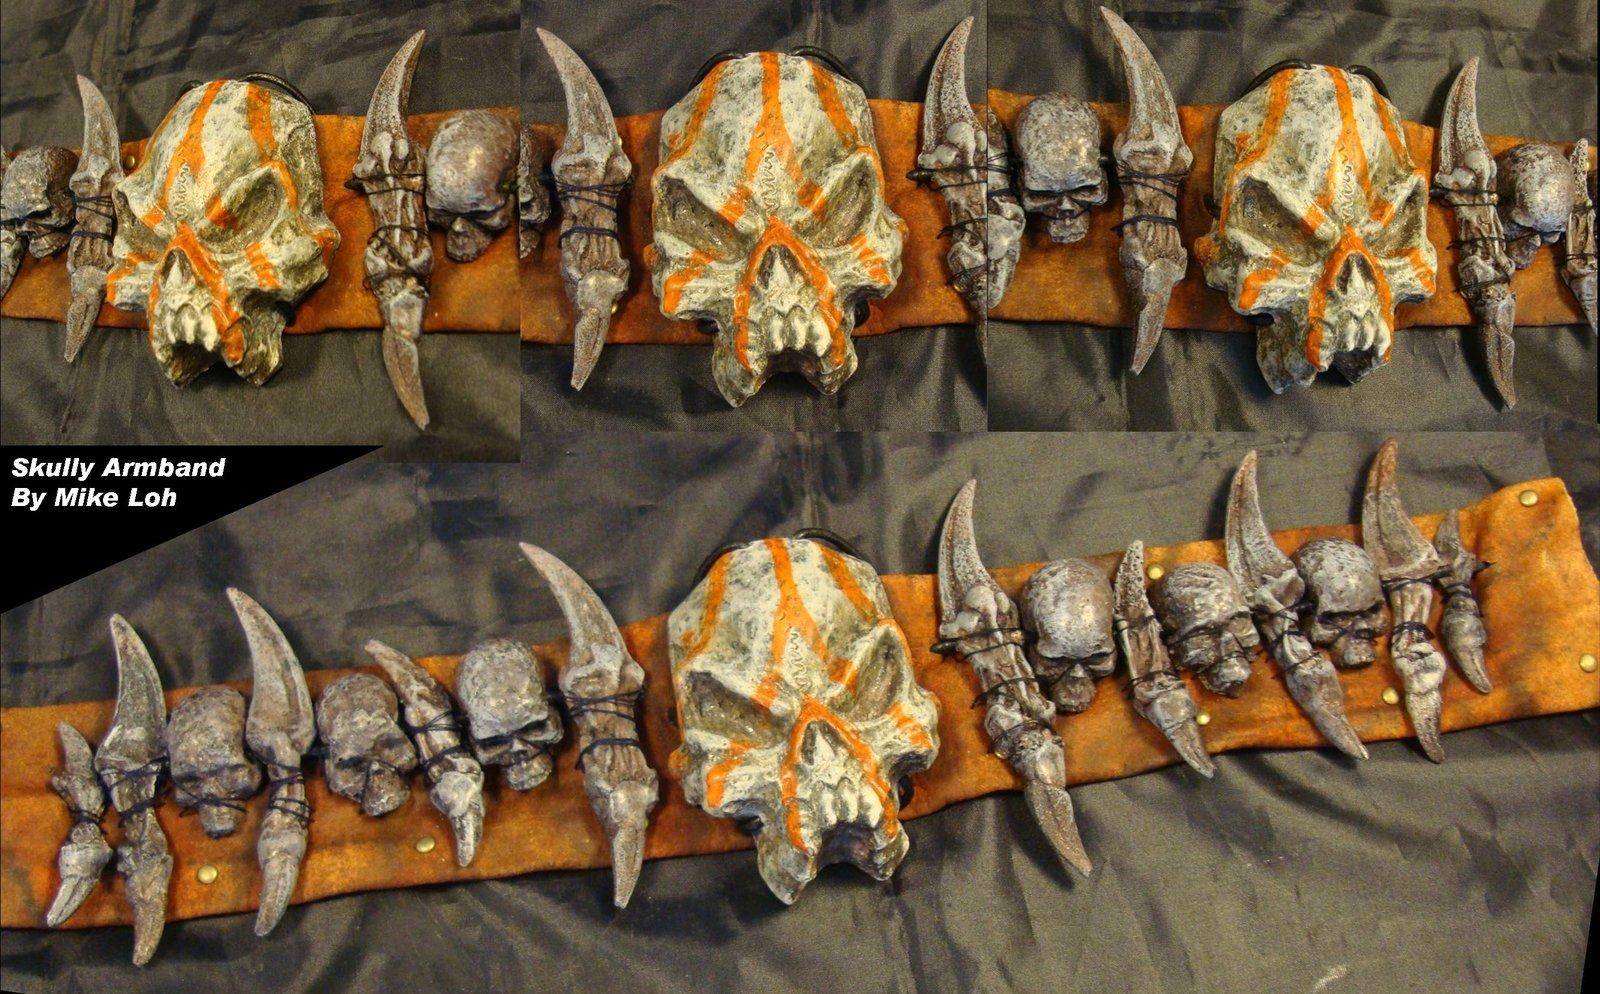 Skully_Predator_Armband_by_MichaelLoh.jpg